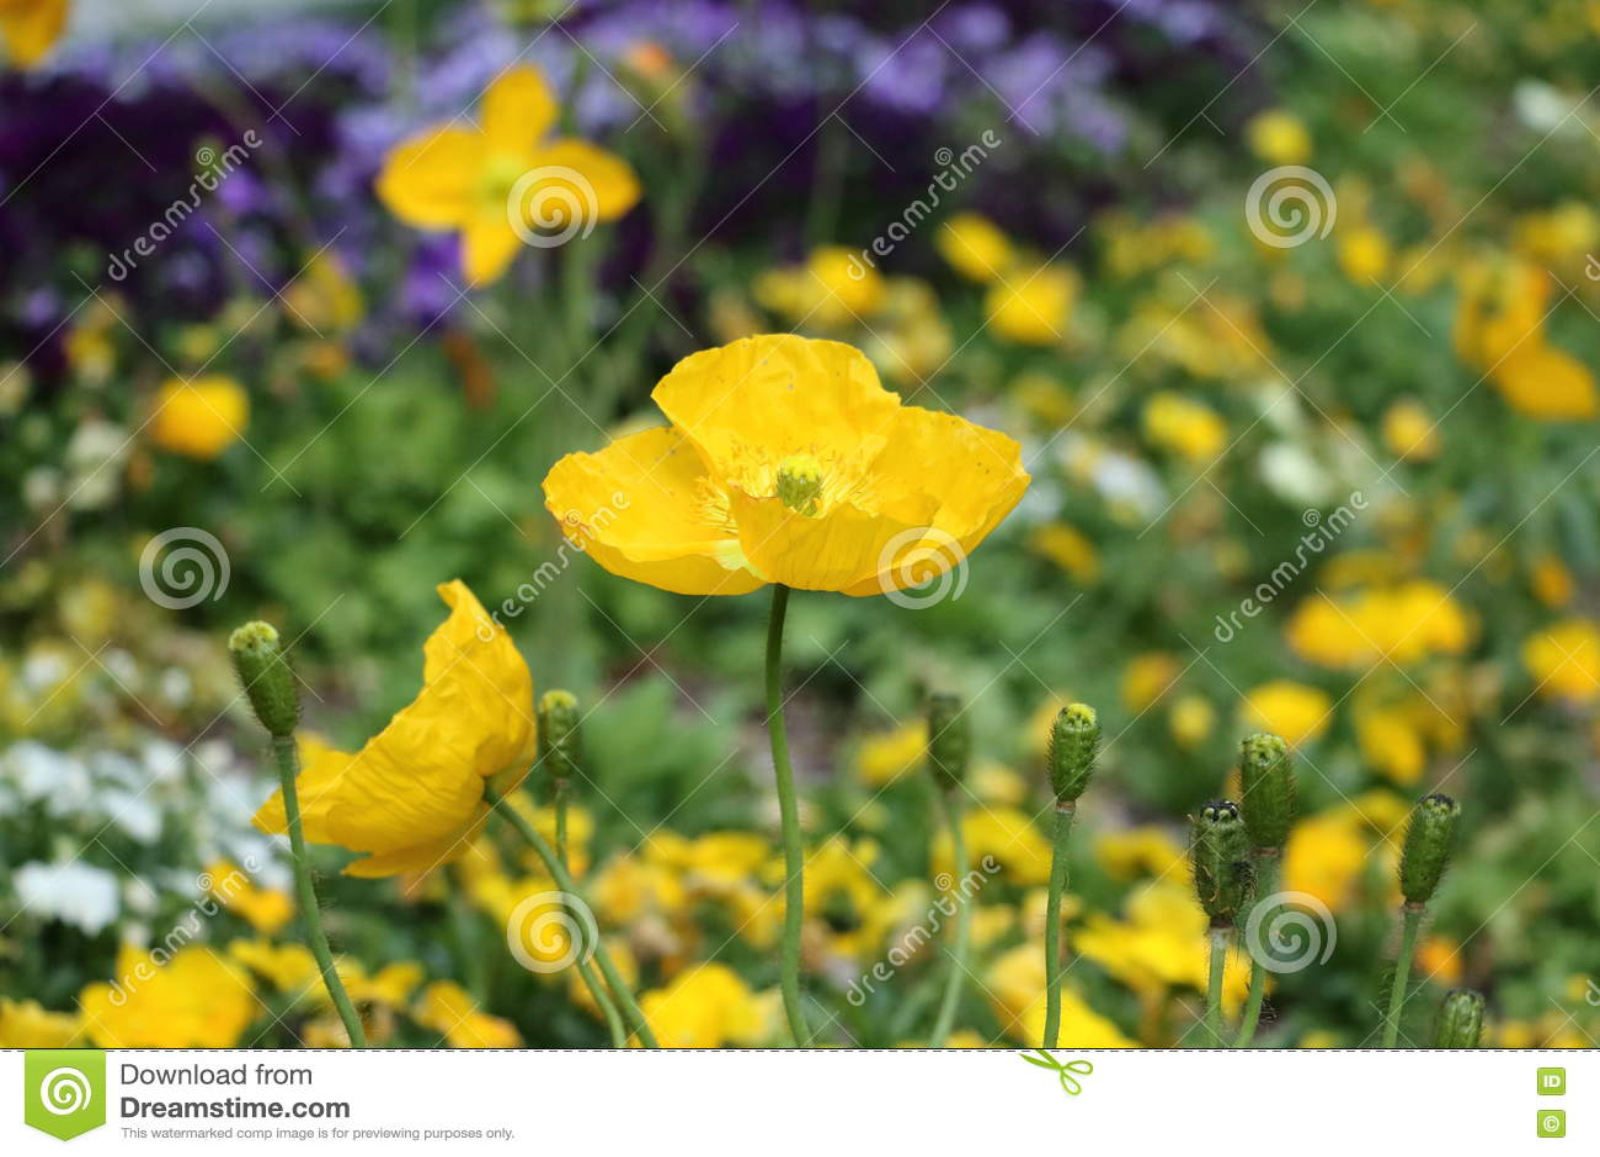 Yellow Poppy Flower Stock Image Image Of Fields Plant 72368315